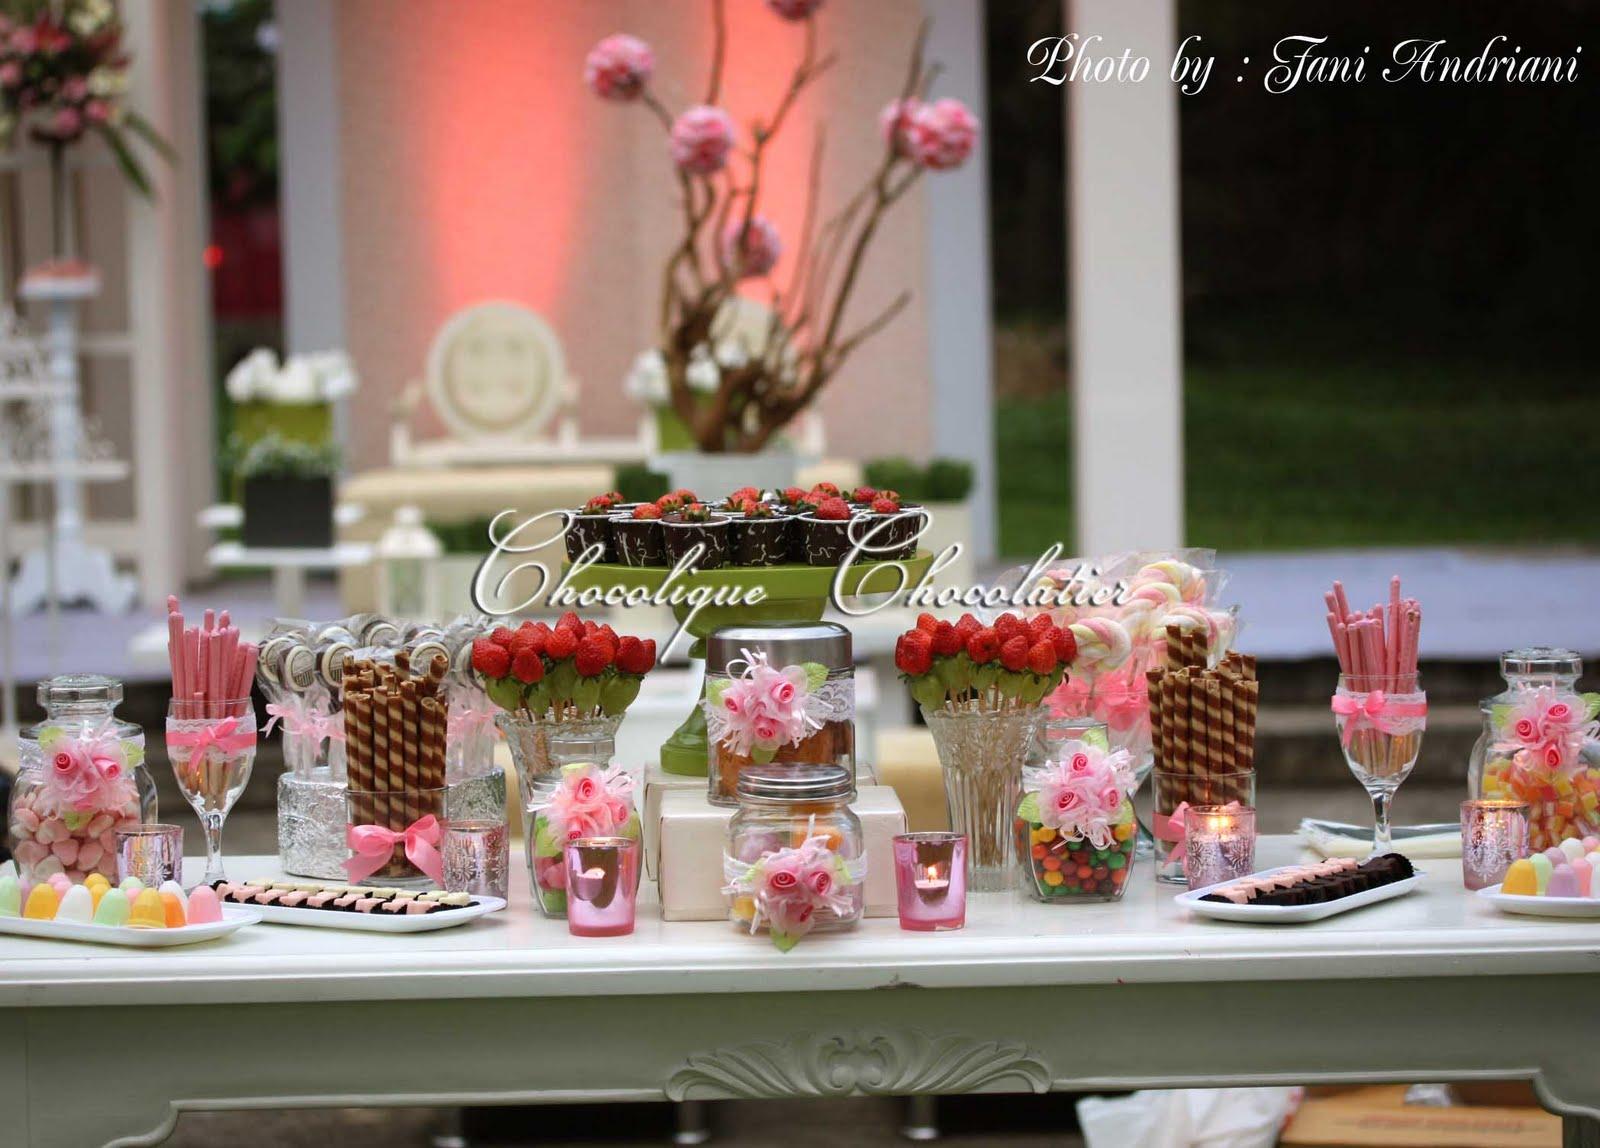 Chocolique Chocolatier Candy Bar for Hans  Uvicks Wedding Reception